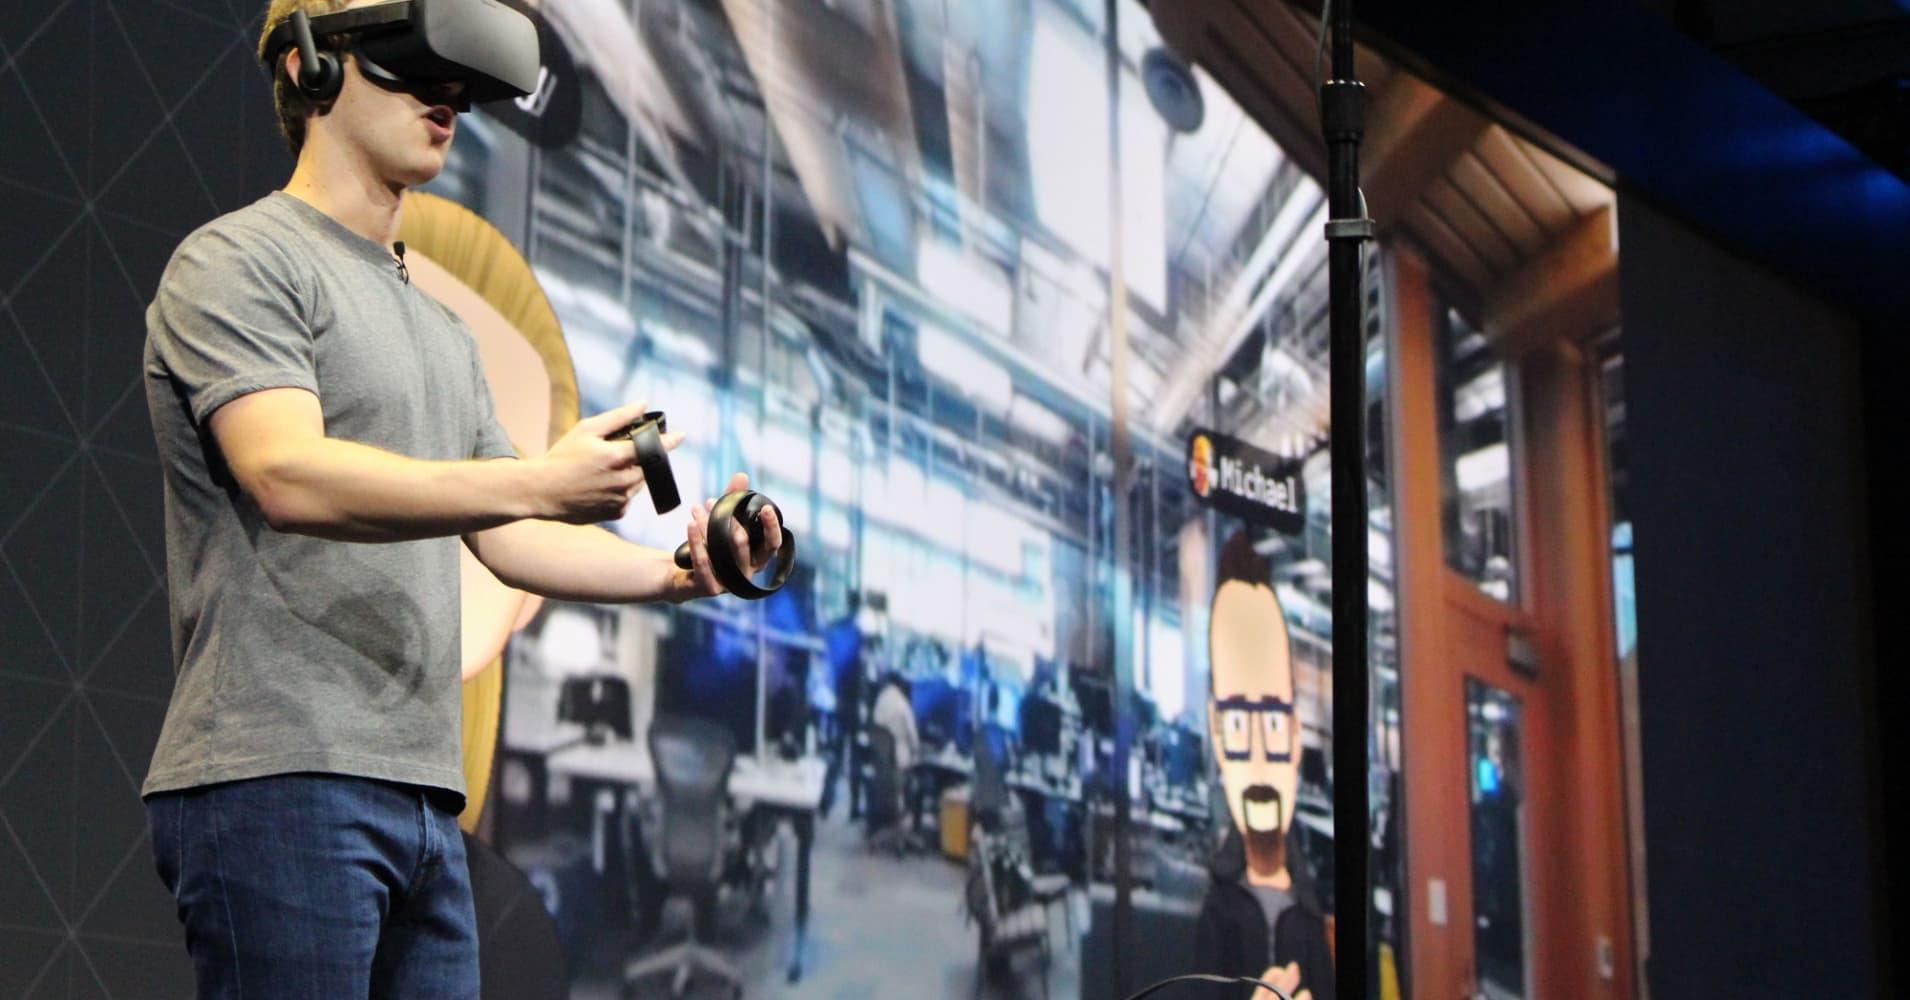 Facebook's Virtual Reality Unit Oculus Shutters Film Studio